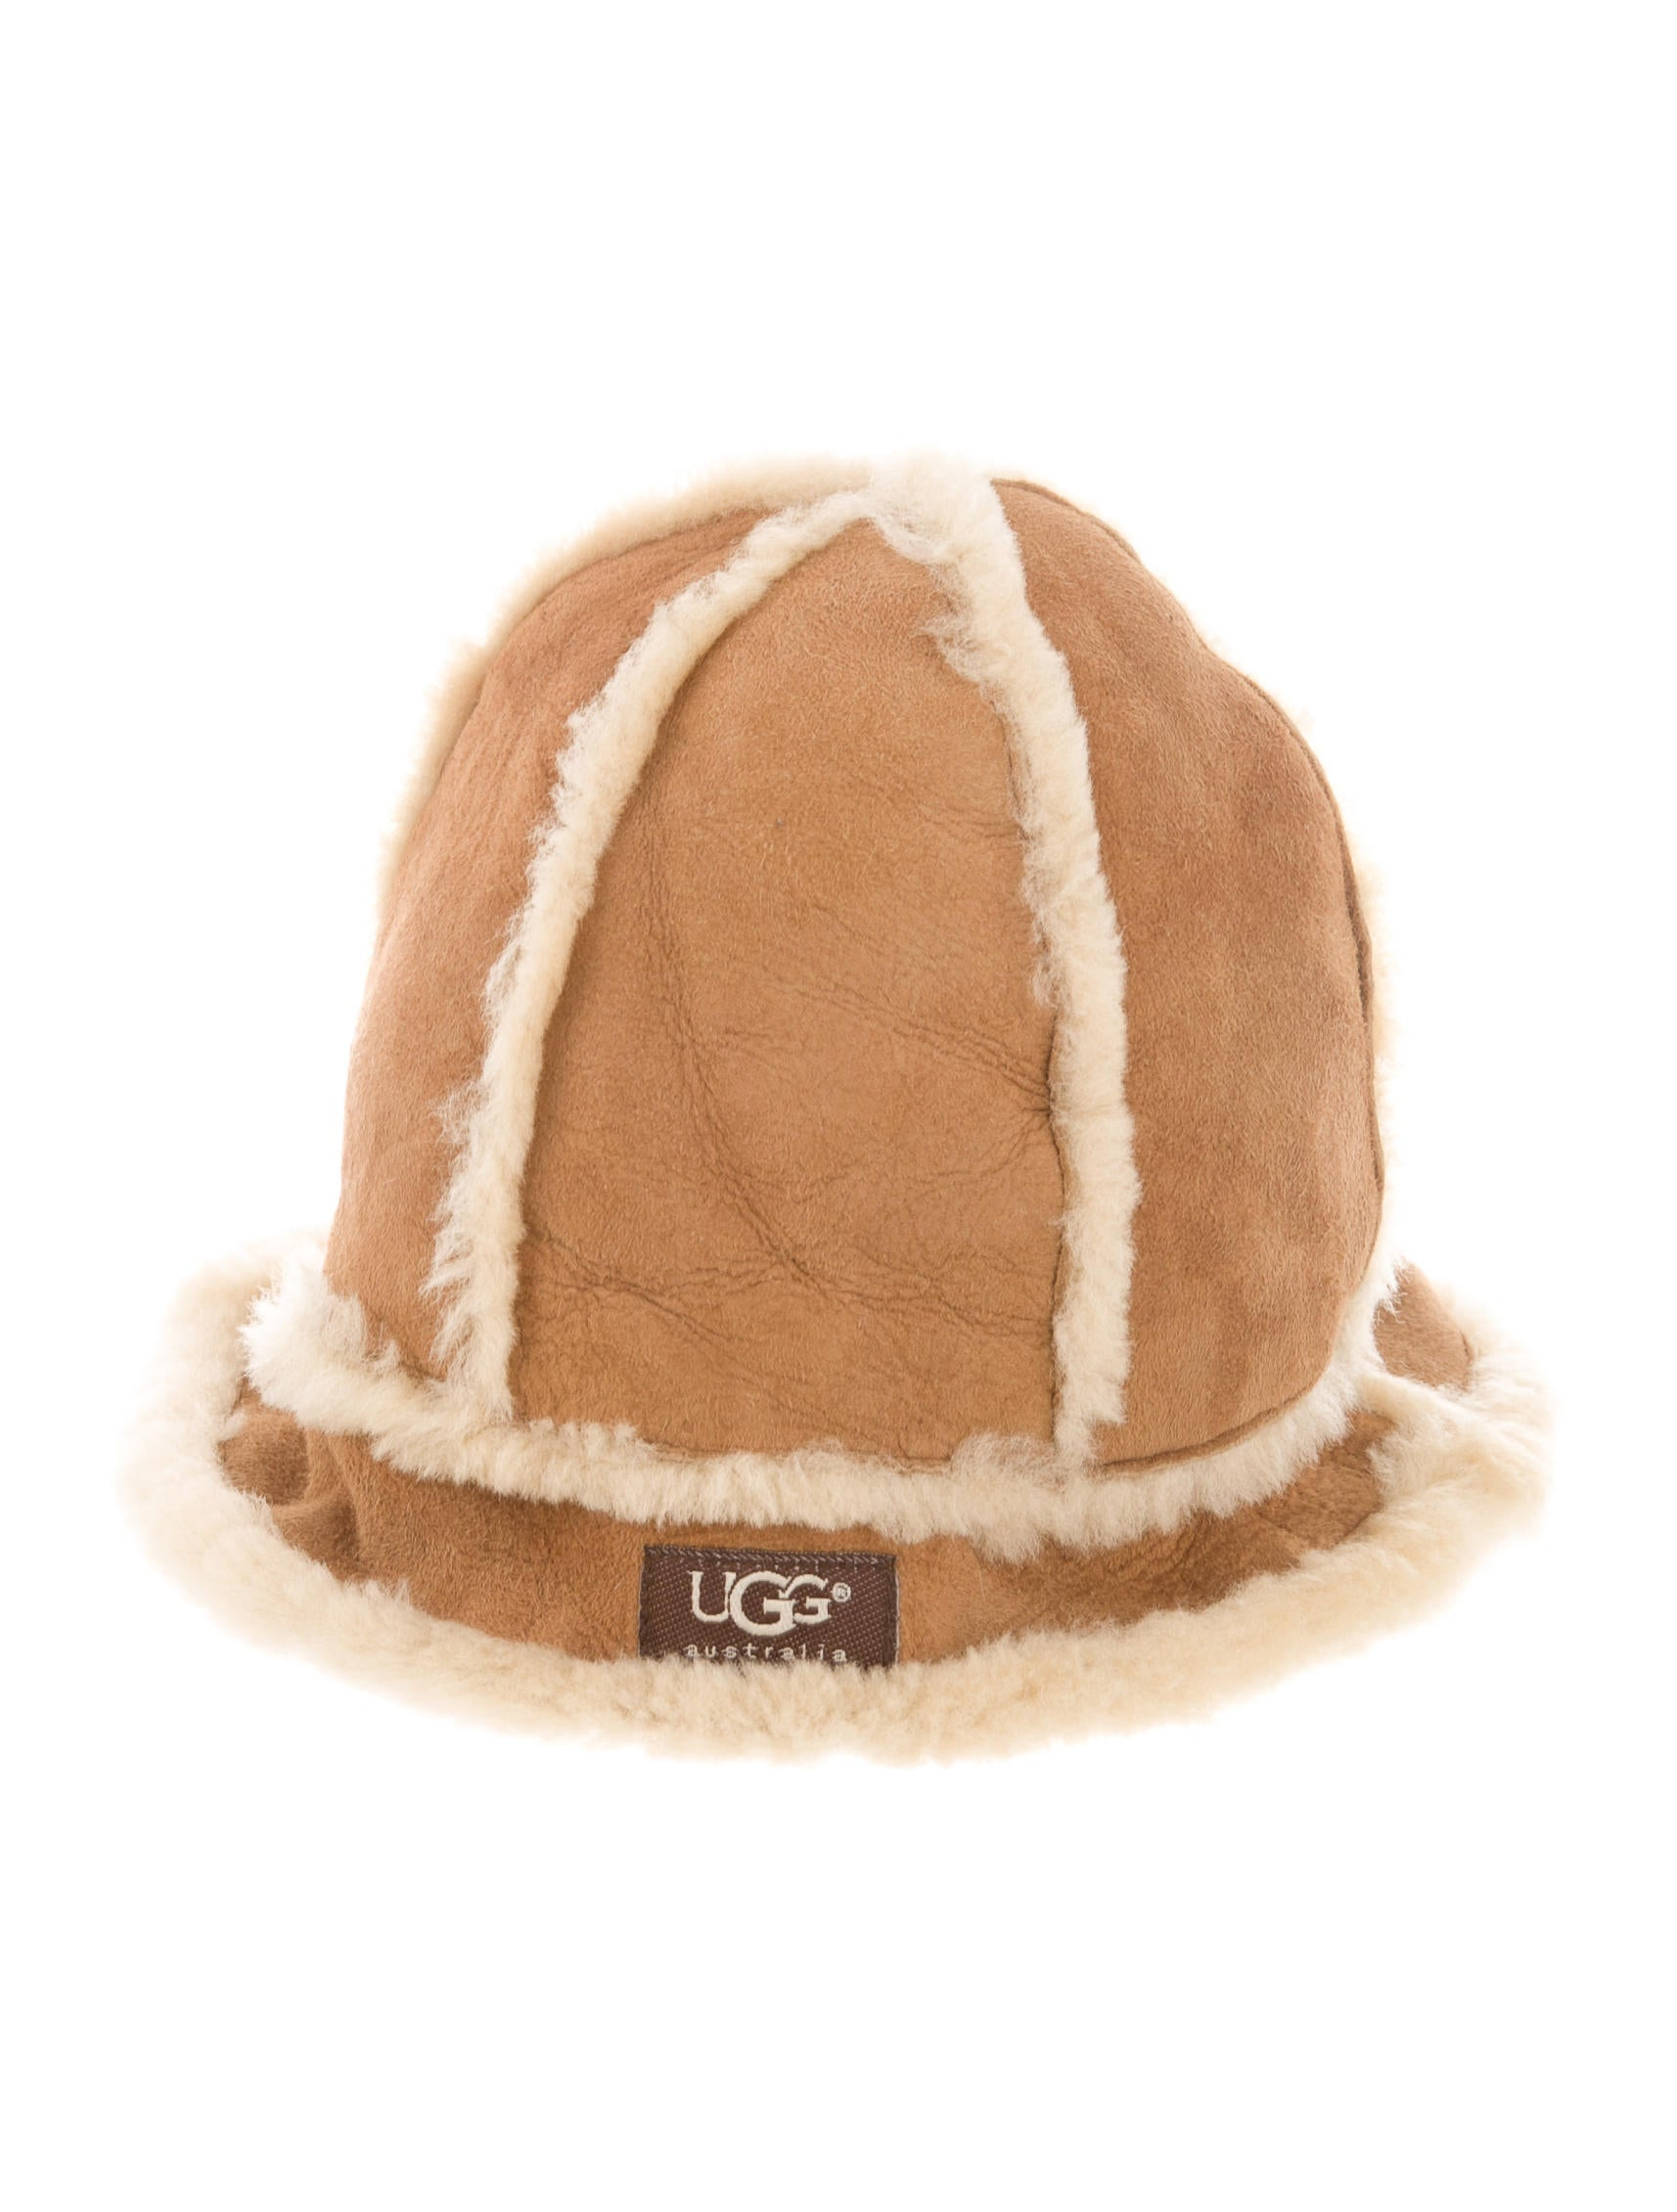 UGG Australia Suede Bucket Hat - Accessories - WUUGG21768  1003823f5f3